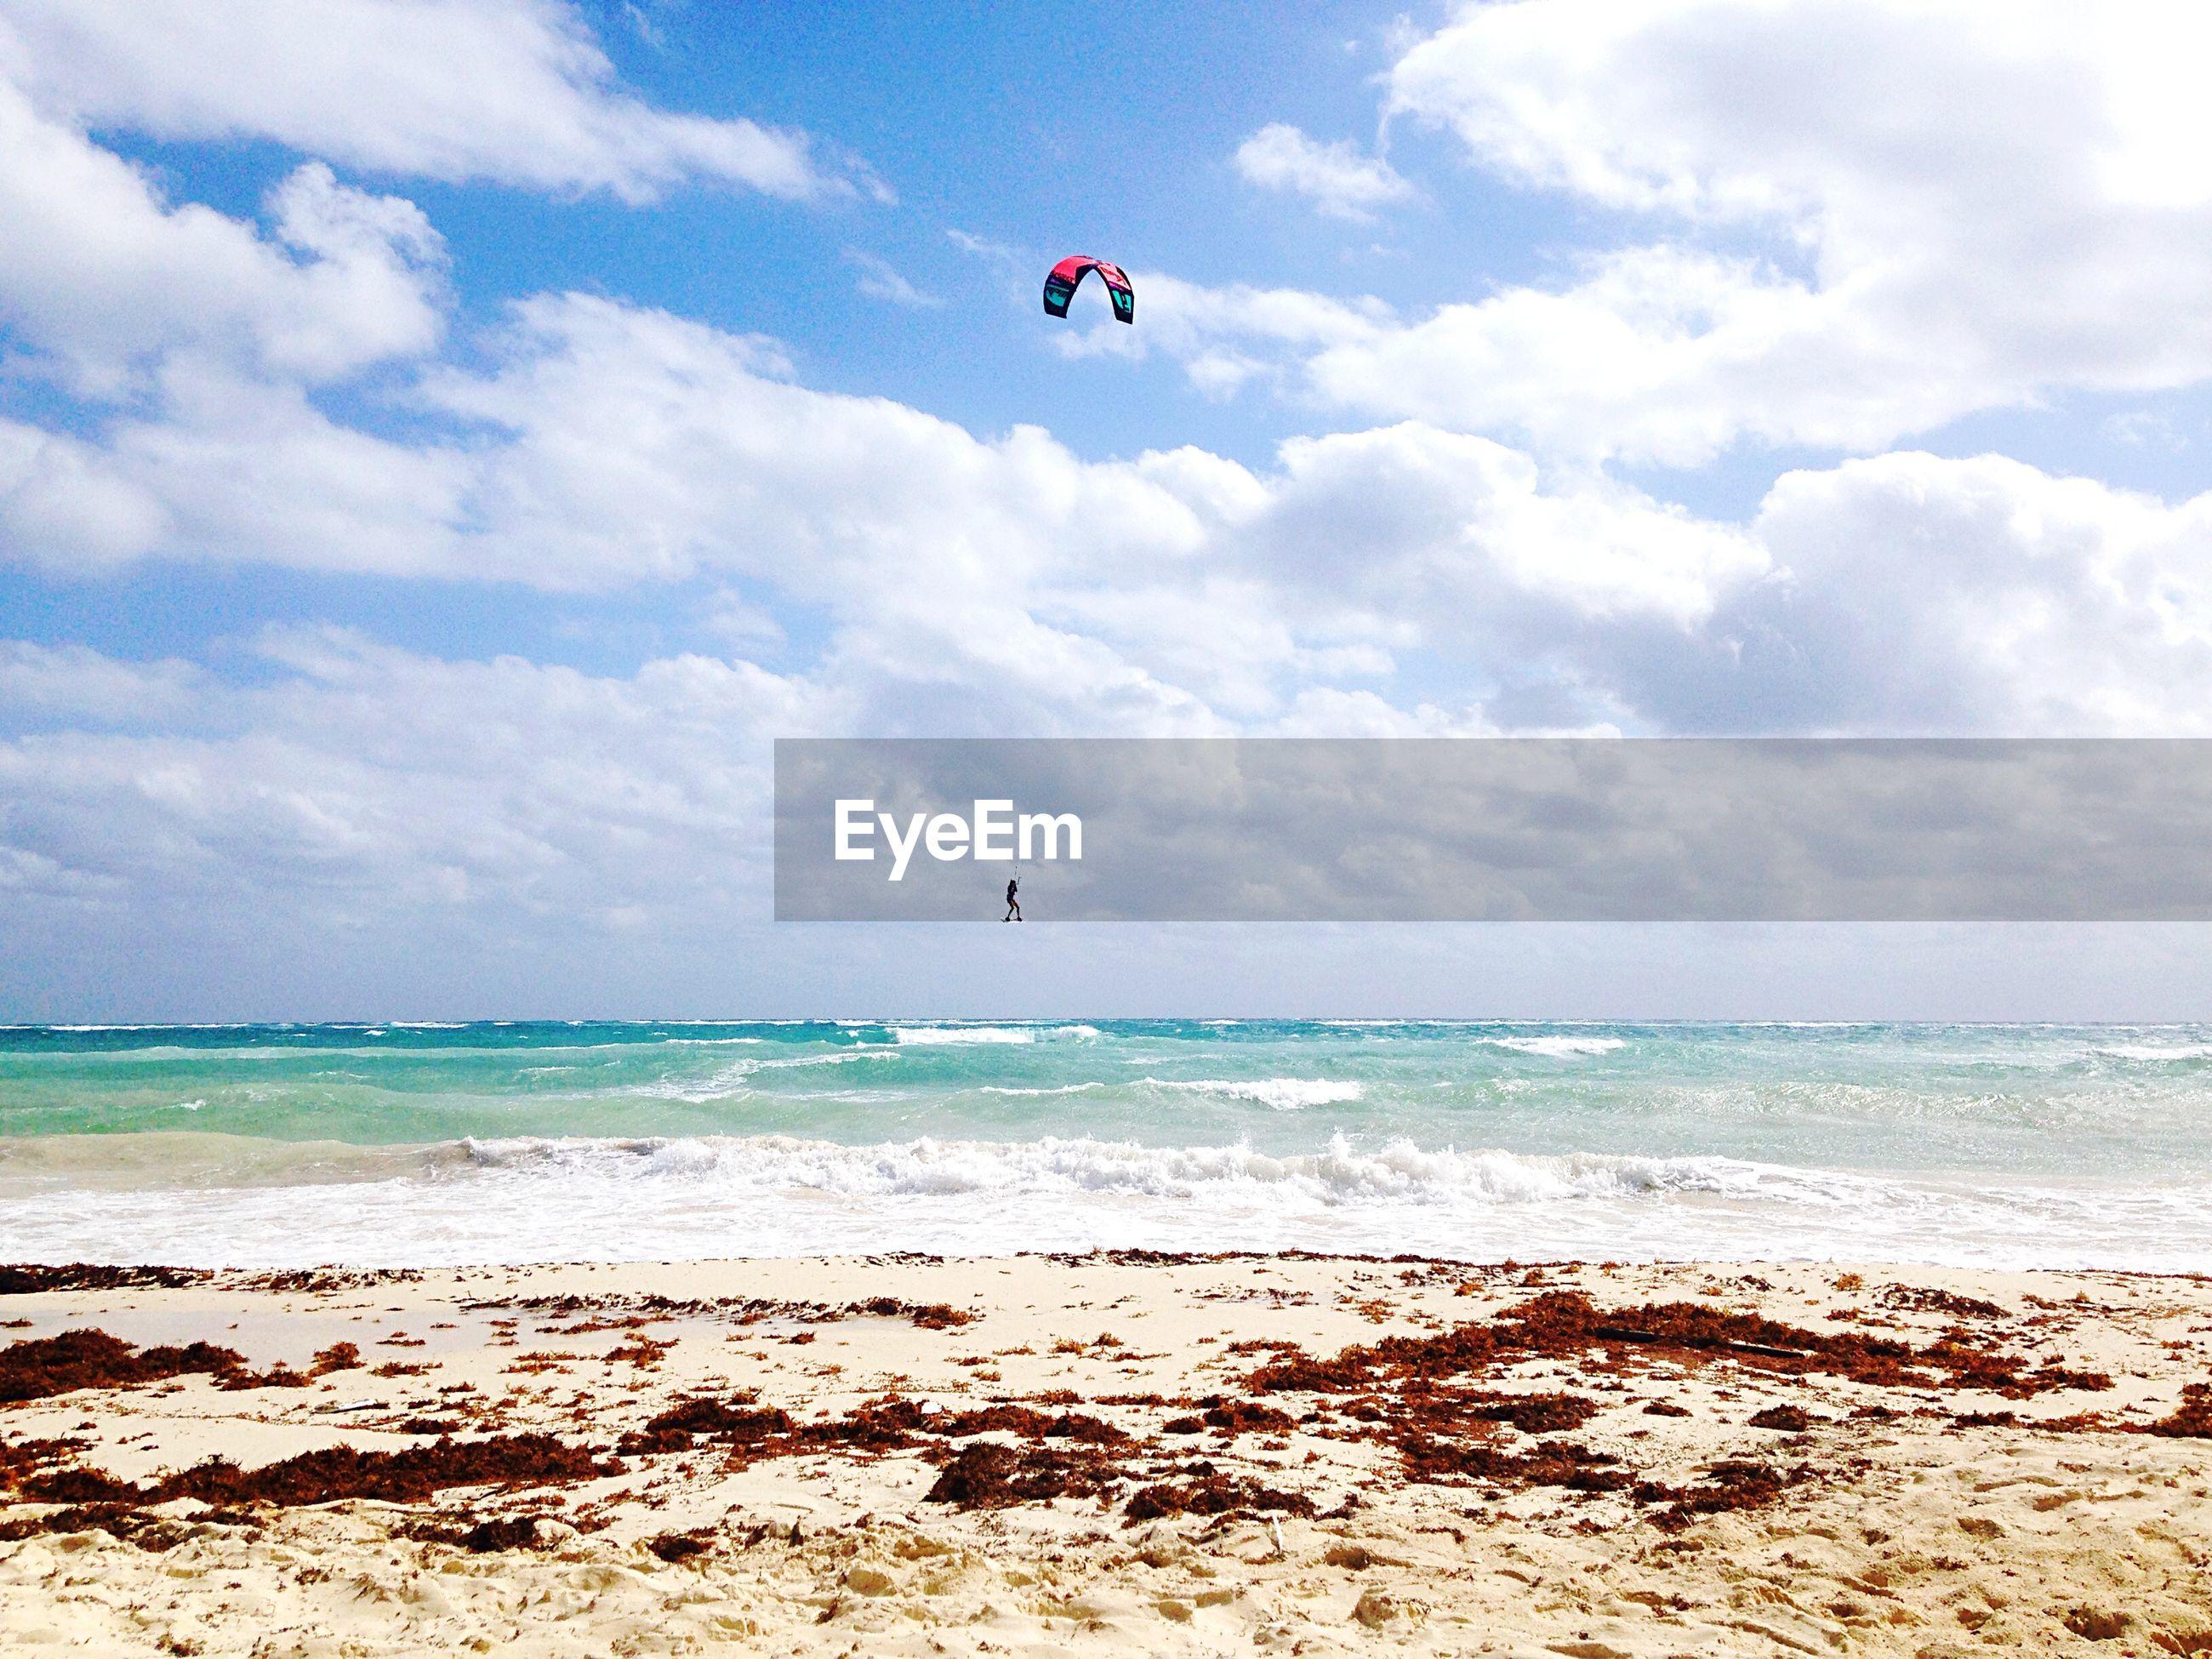 Person paragliding over beach